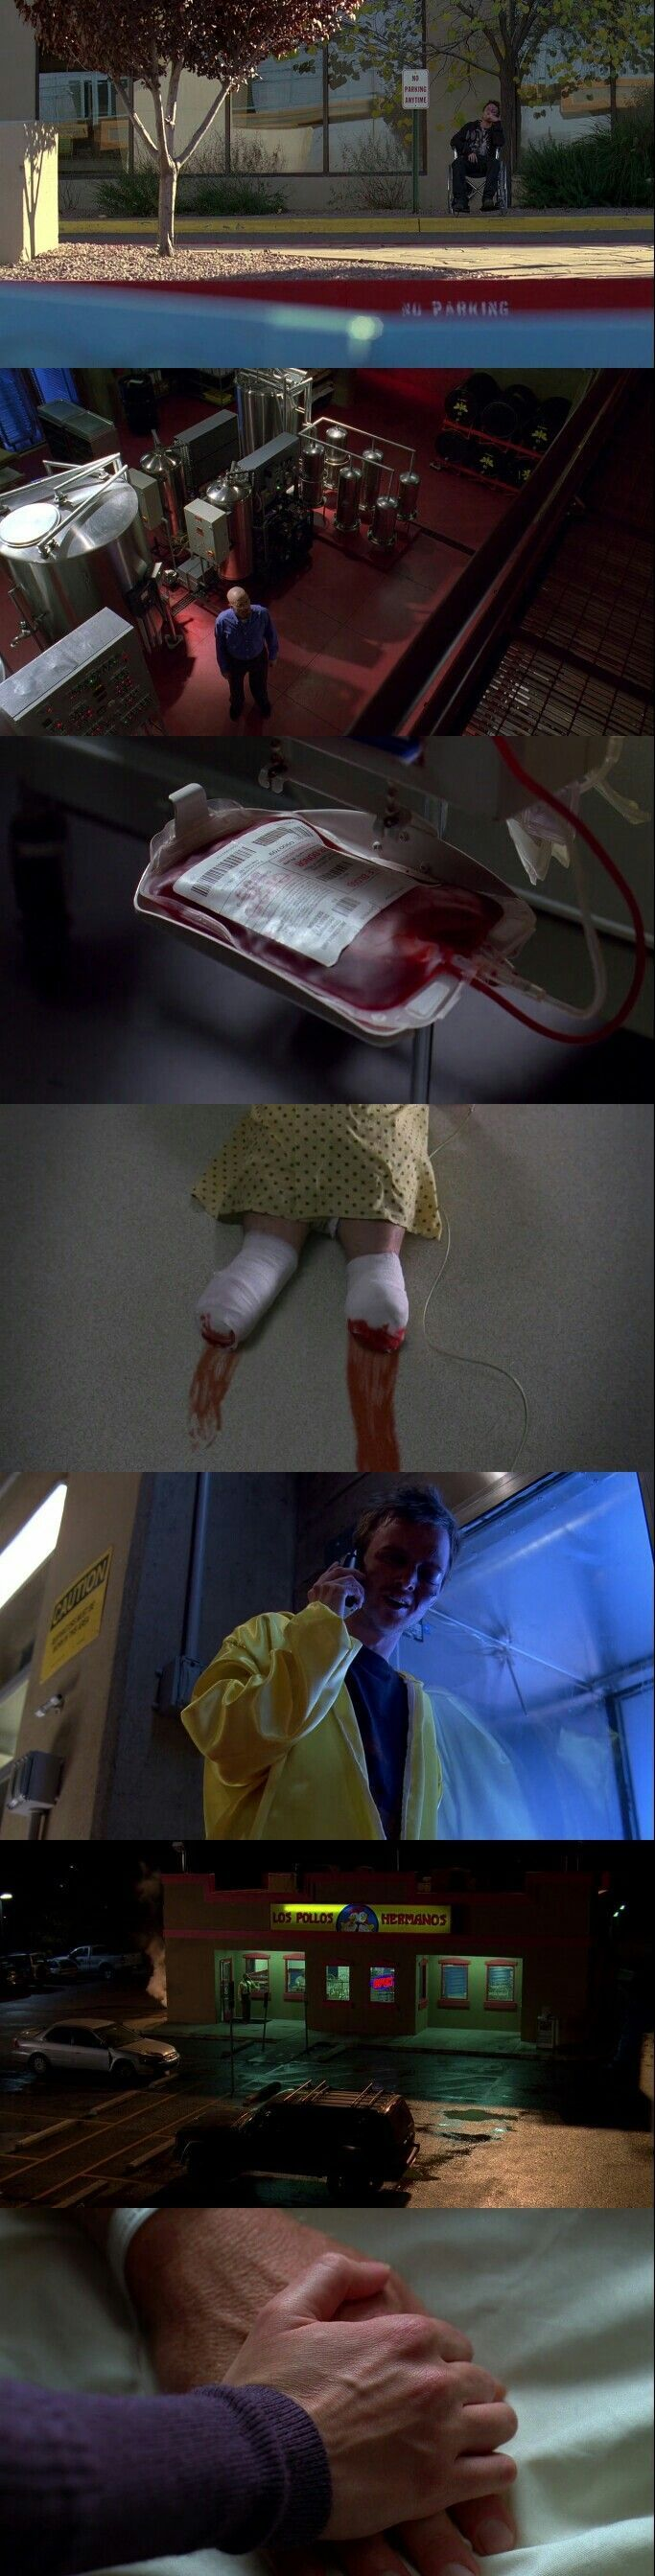 Breaking Bad( 2008 - 2013 ) Season 3 Episode 8: I See You.